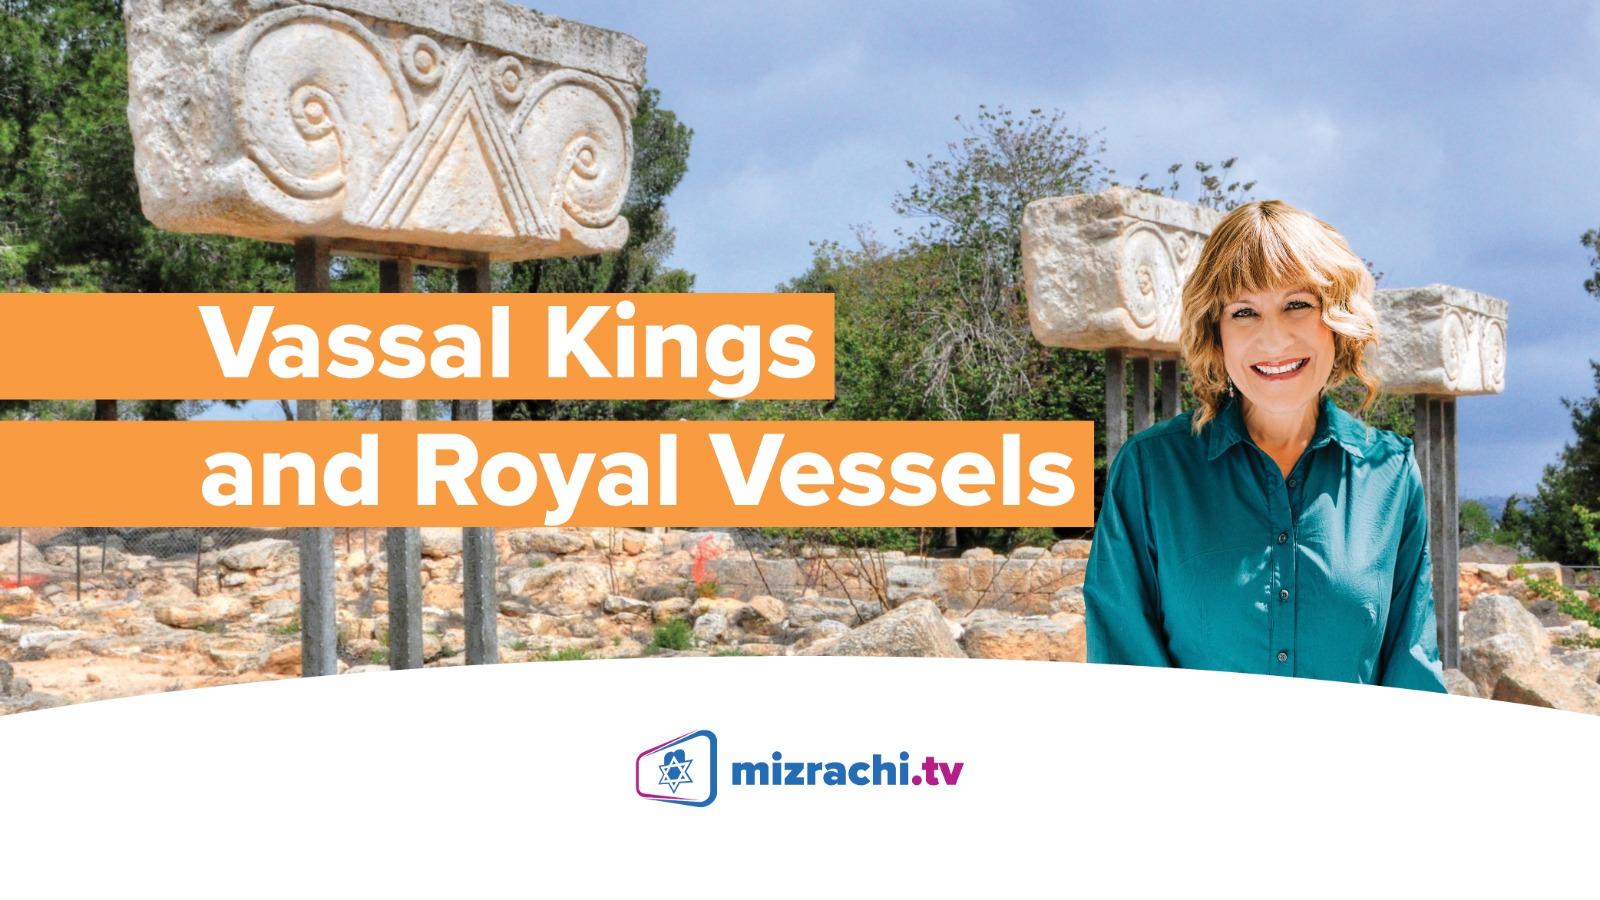 Vassal Kings and Royal Vessels